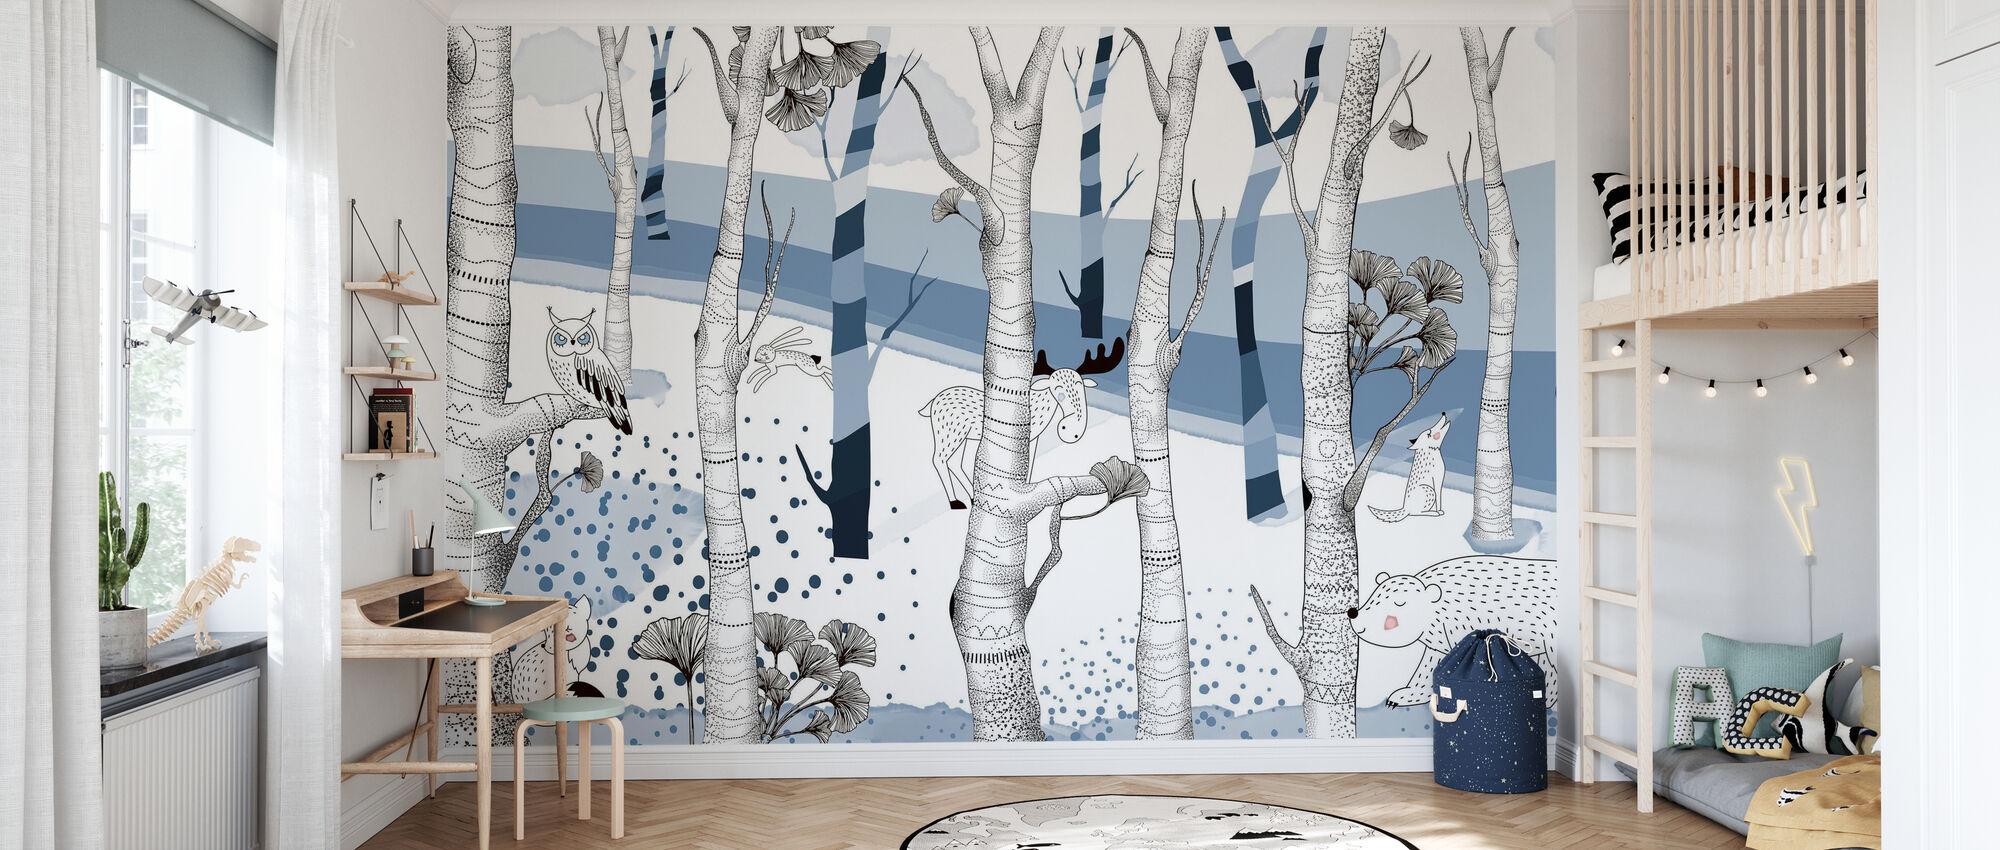 Woodland - Blue - Wallpaper - Kids Room